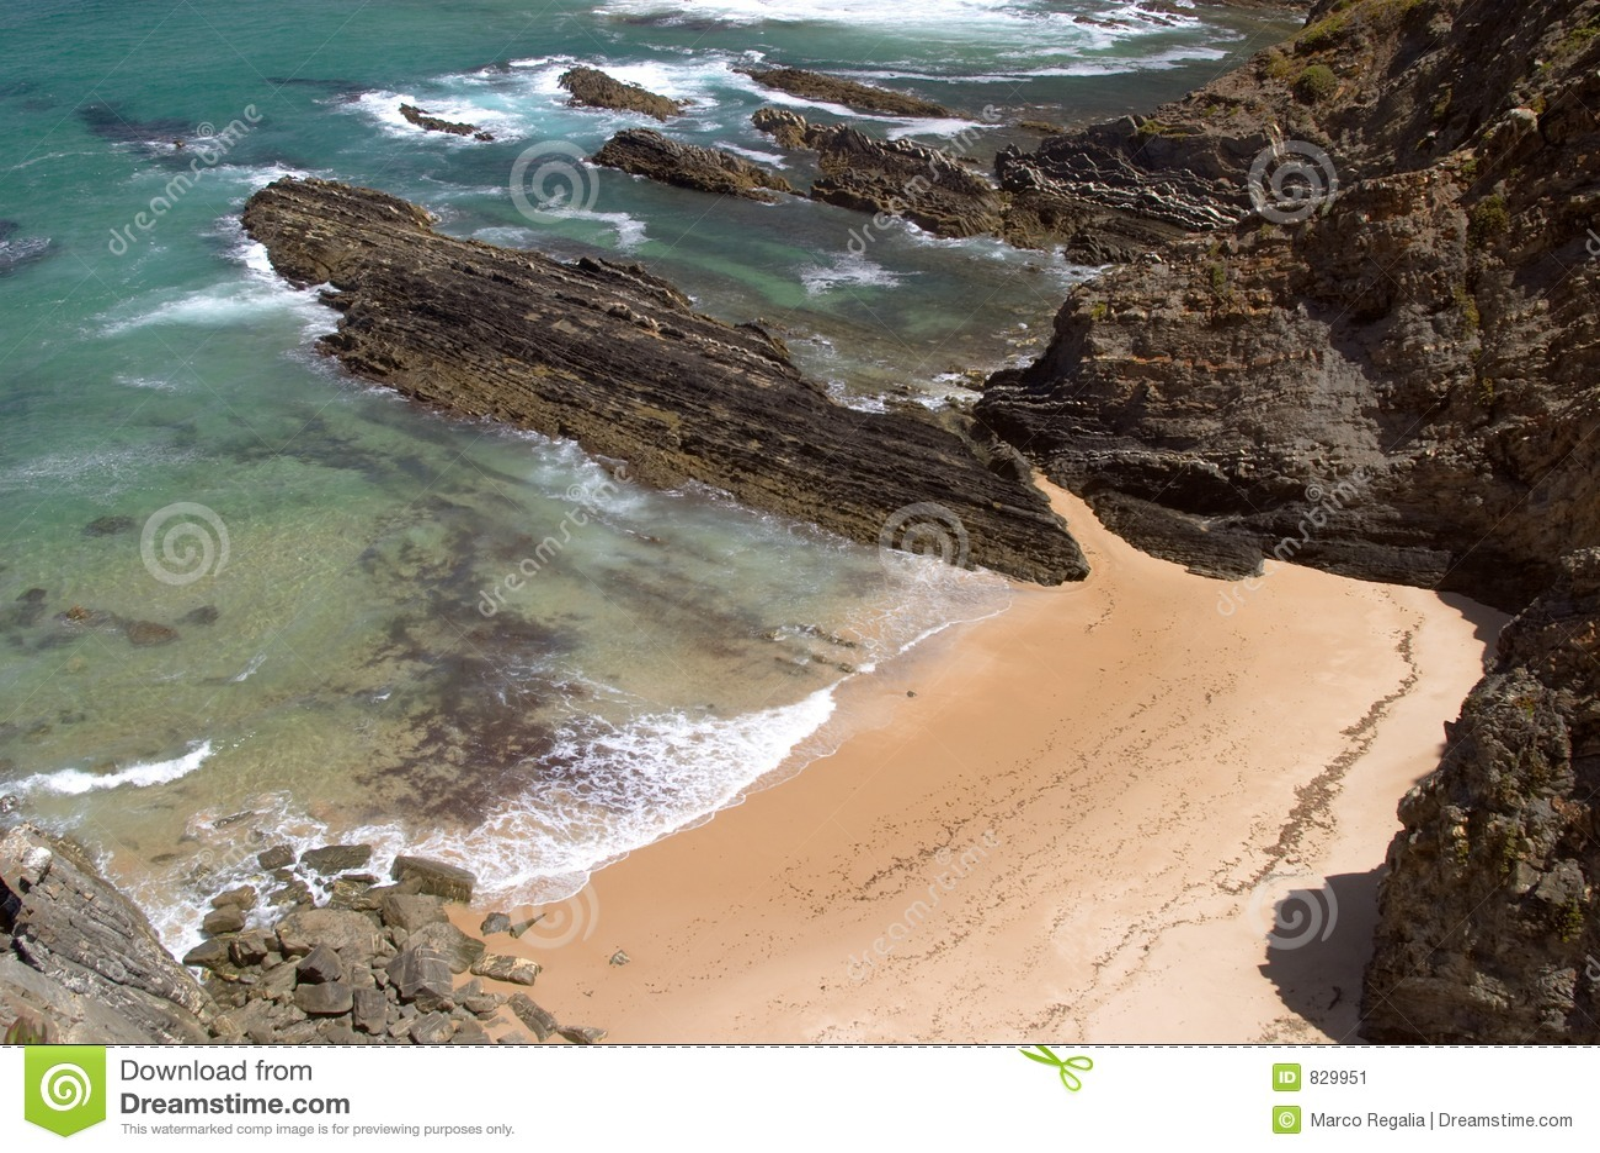 Atlantic ocean beach at Sardao cape (Cabo Sardao)